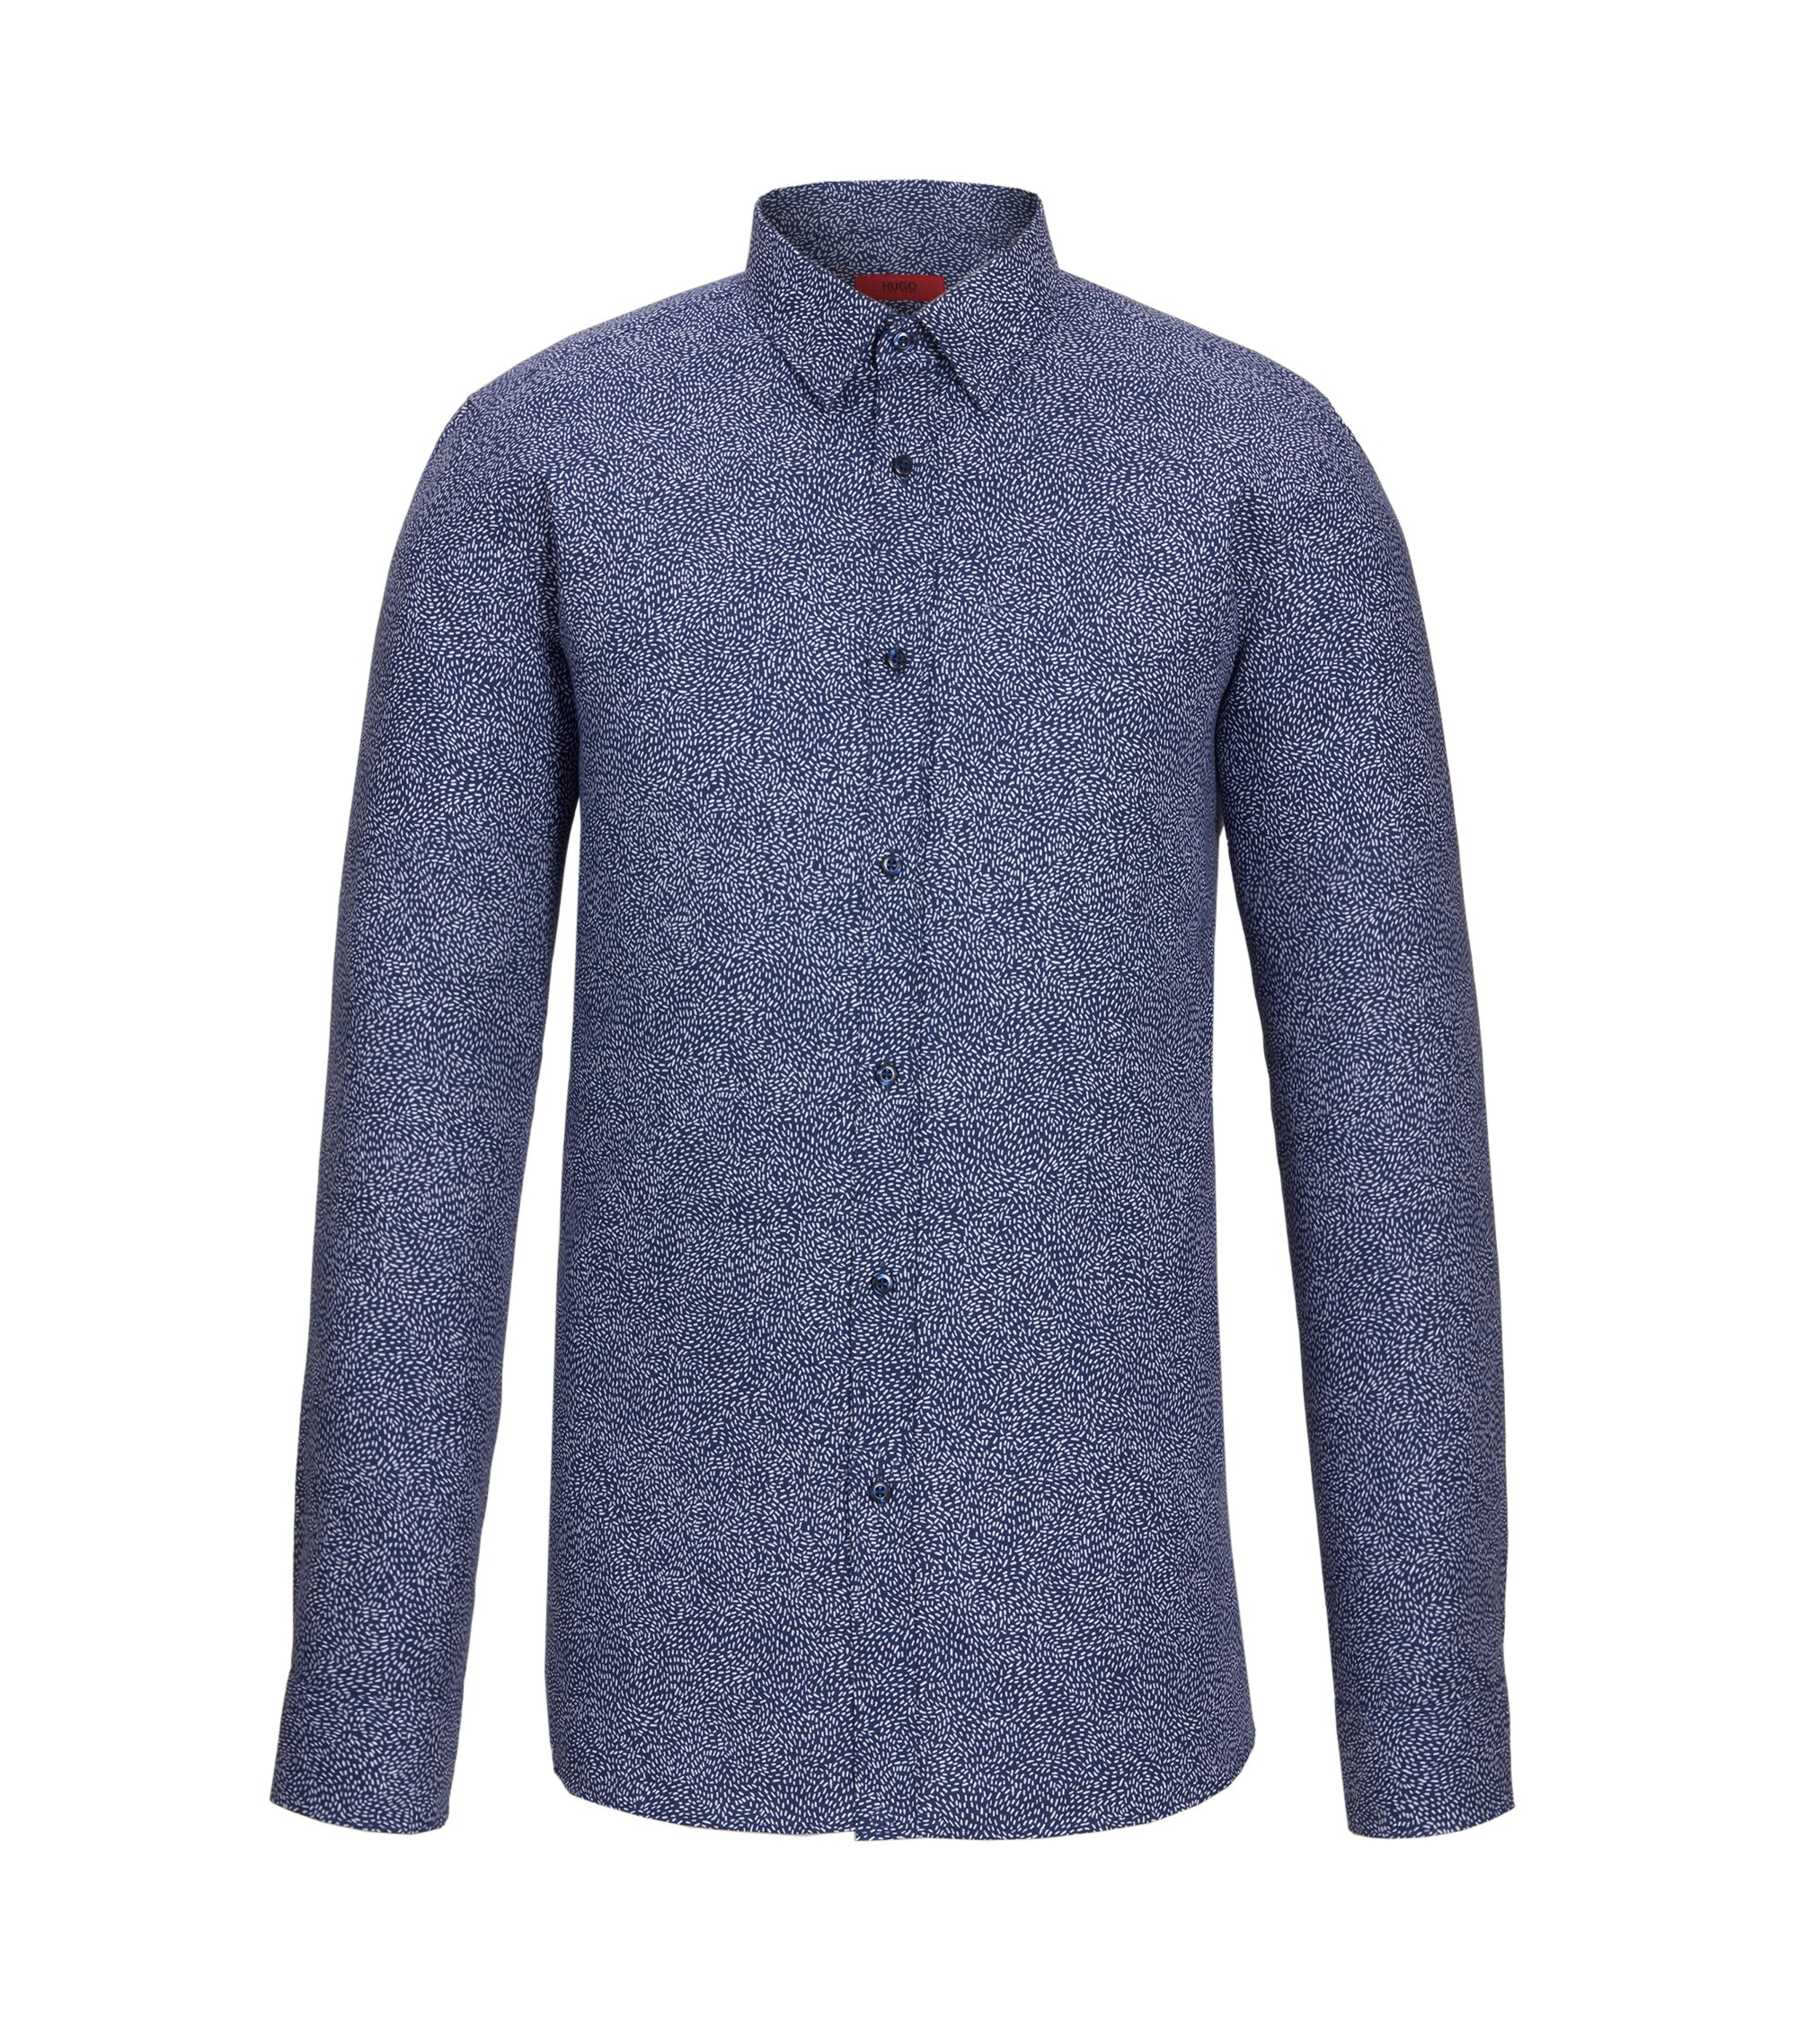 Cotton Easy Iron Button Down Shirt, Extra Slim Fit | Elisha, Dark Blue